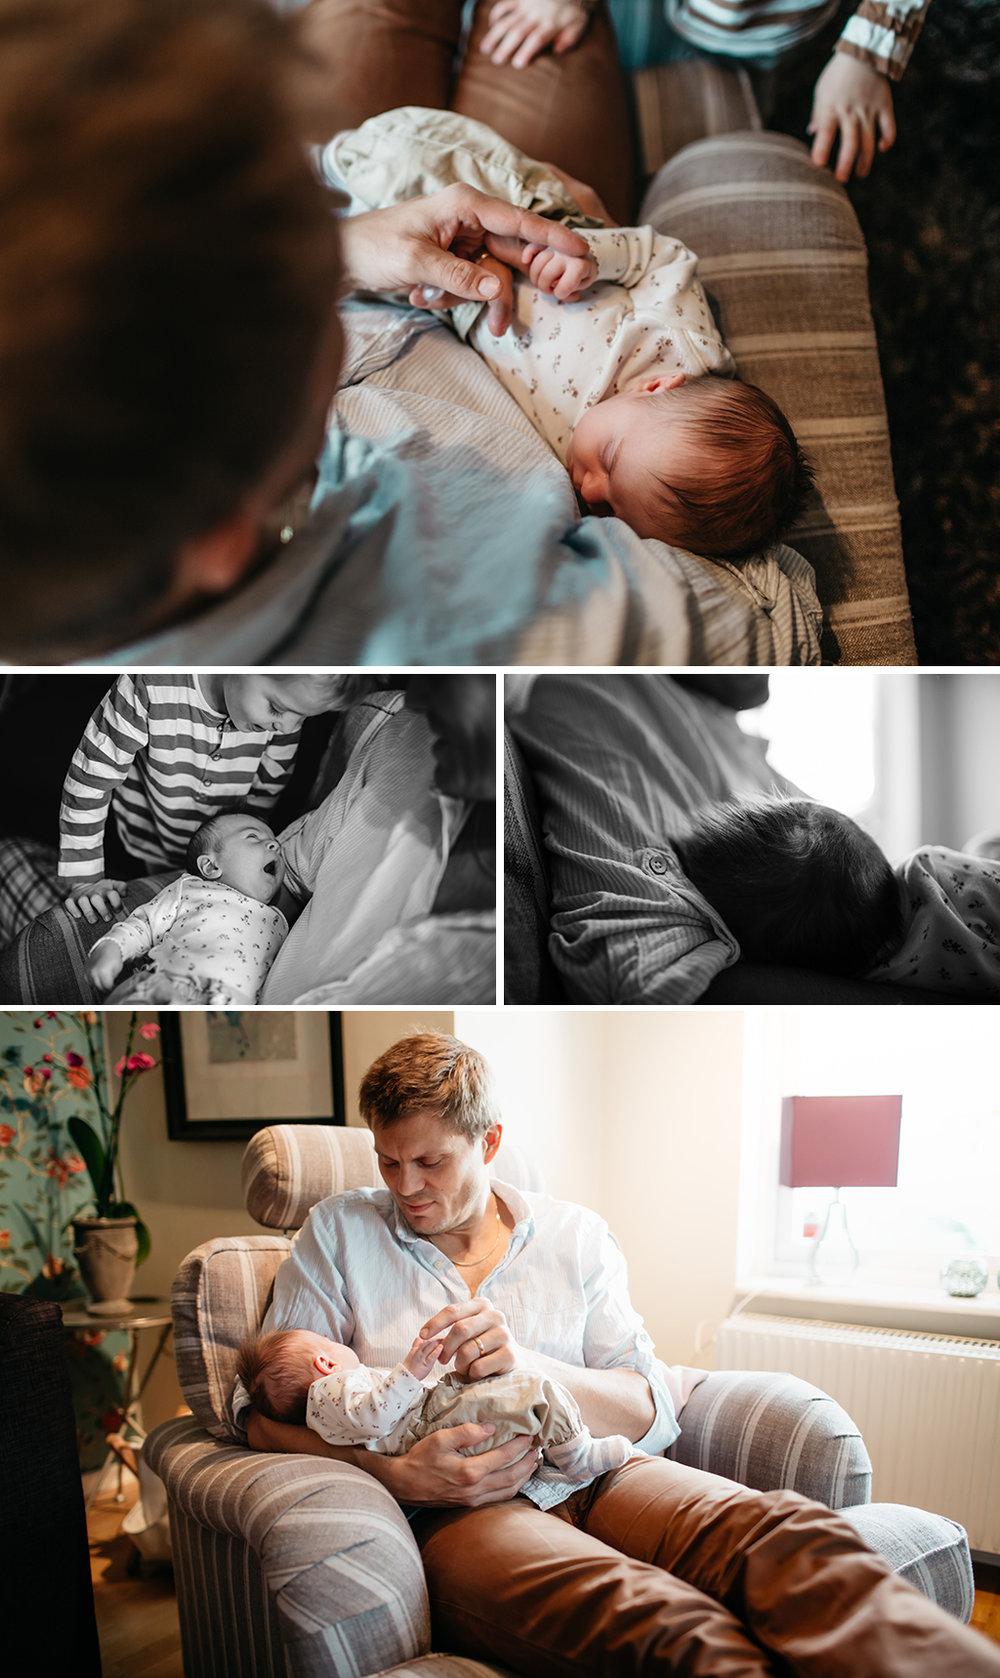 Nyfoddfotografering-lifestyle-familjefotograf-Stockholm_2.jpg